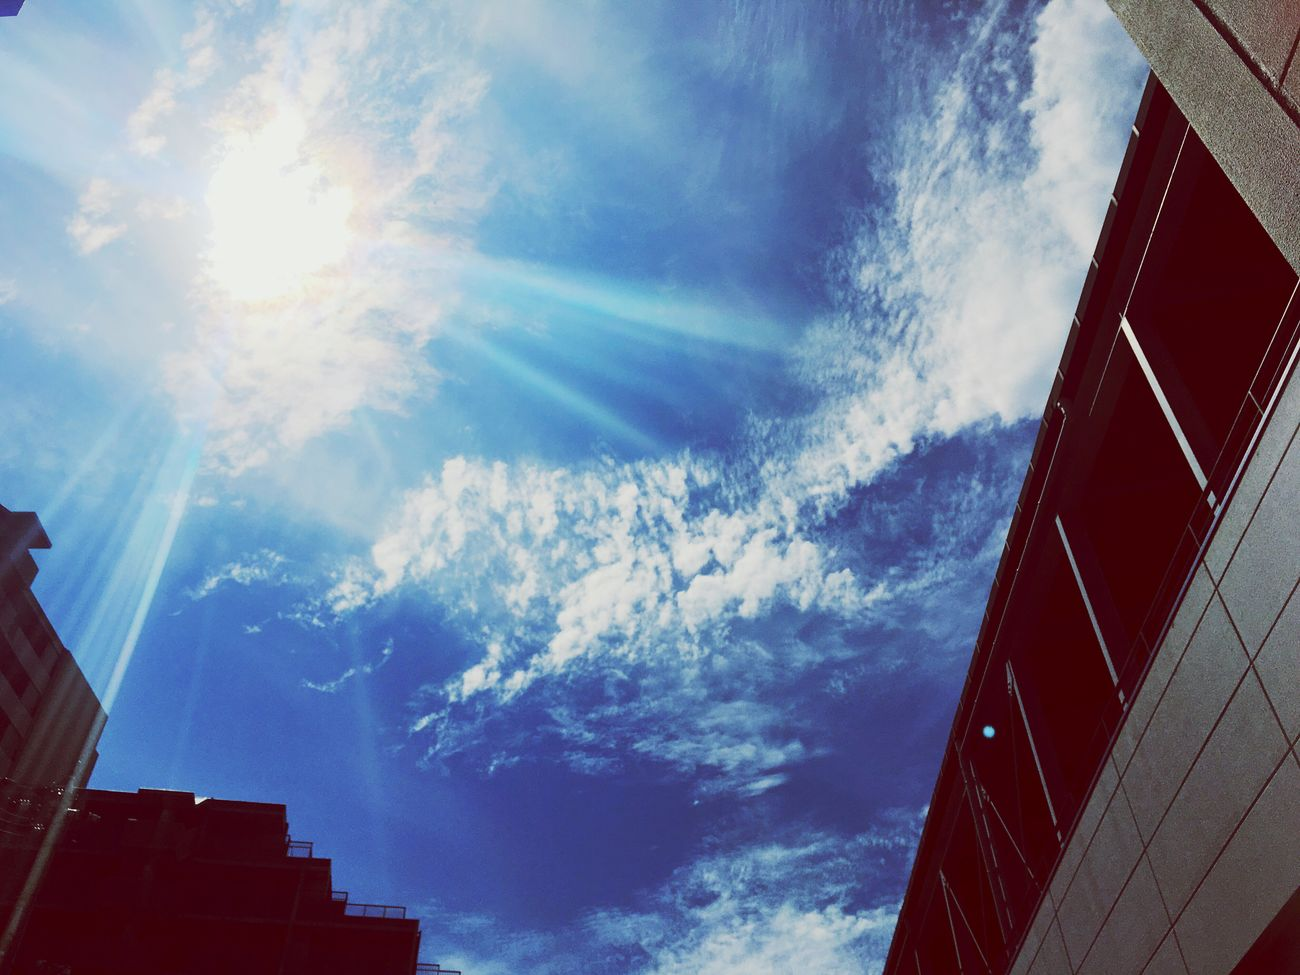 Japan Kobe Cloud Cloud - Sky Sun Sunshine Beautiful Blue Clouds And Sky Blue Sky Clear Sky Clearautumnsky Autumn IPhone Today Todayssky Sunny Sunnyday Feelsogood Happy Happyday Beauty In Nature Natural Beauty September 2016